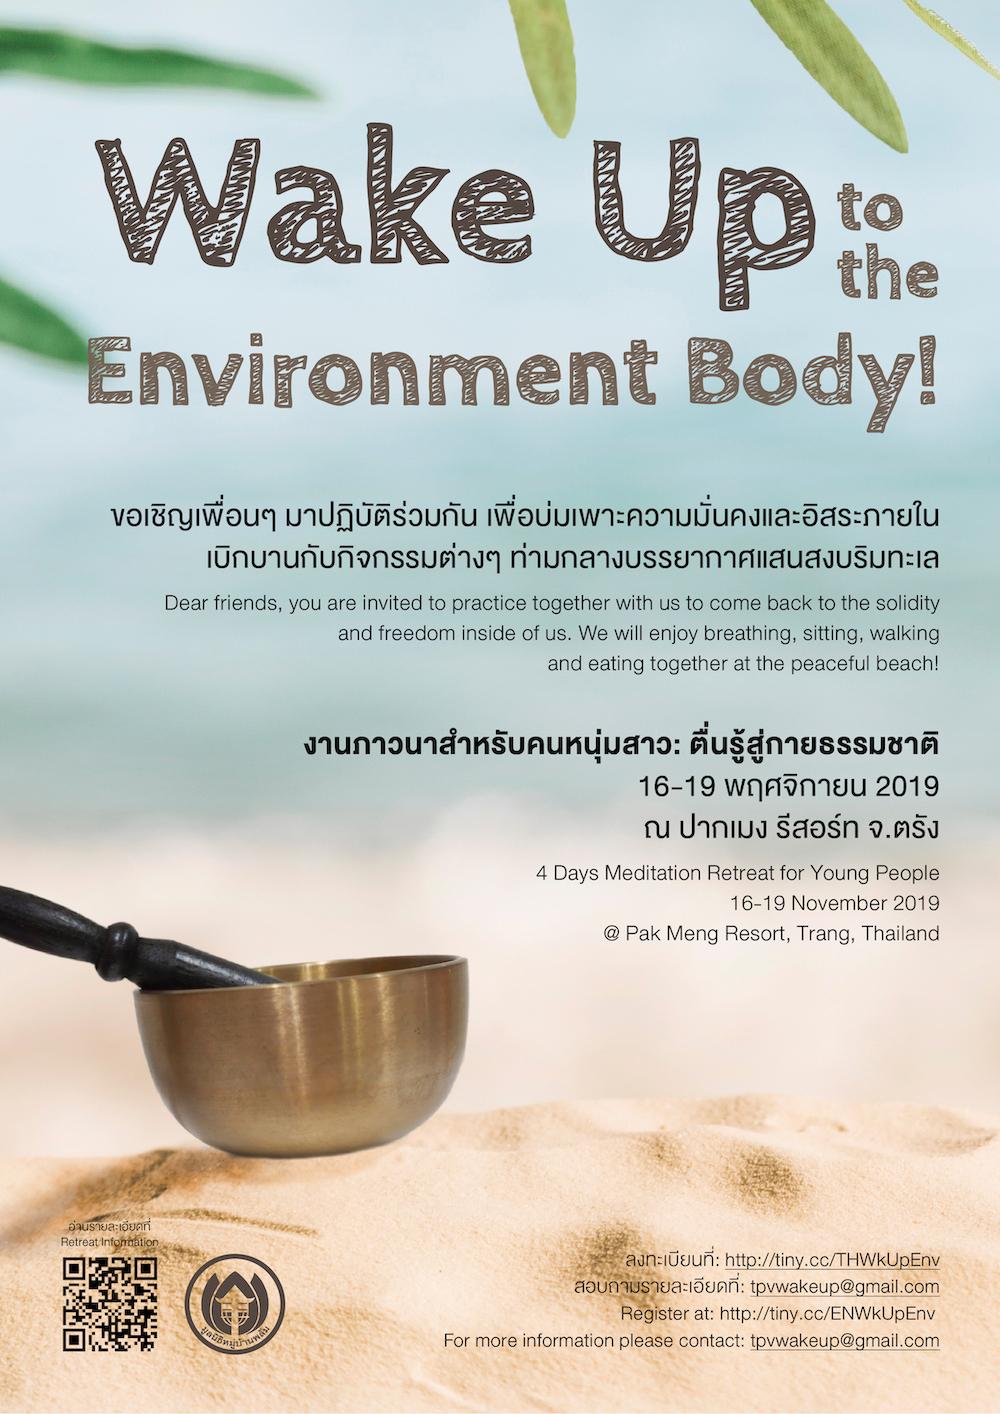 Mindfulness Internship Position in New Zealand - Wake Up